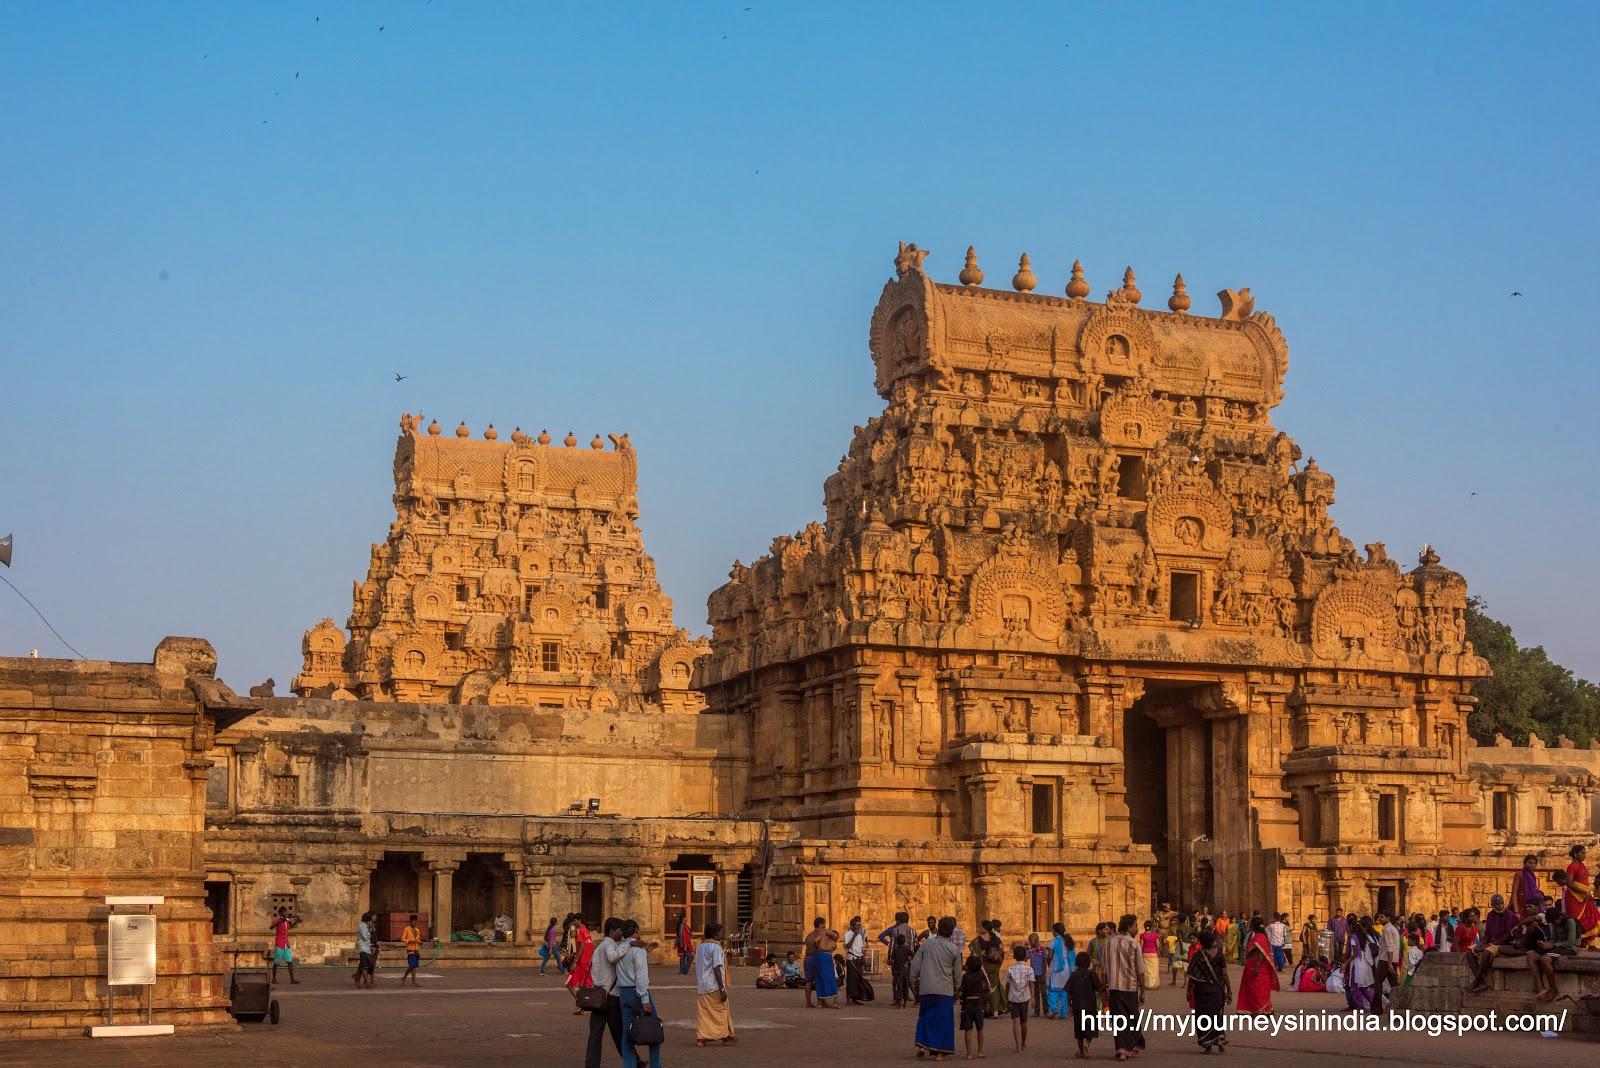 Thanjavur Brihadeeswarar Temple Entrance Tower View